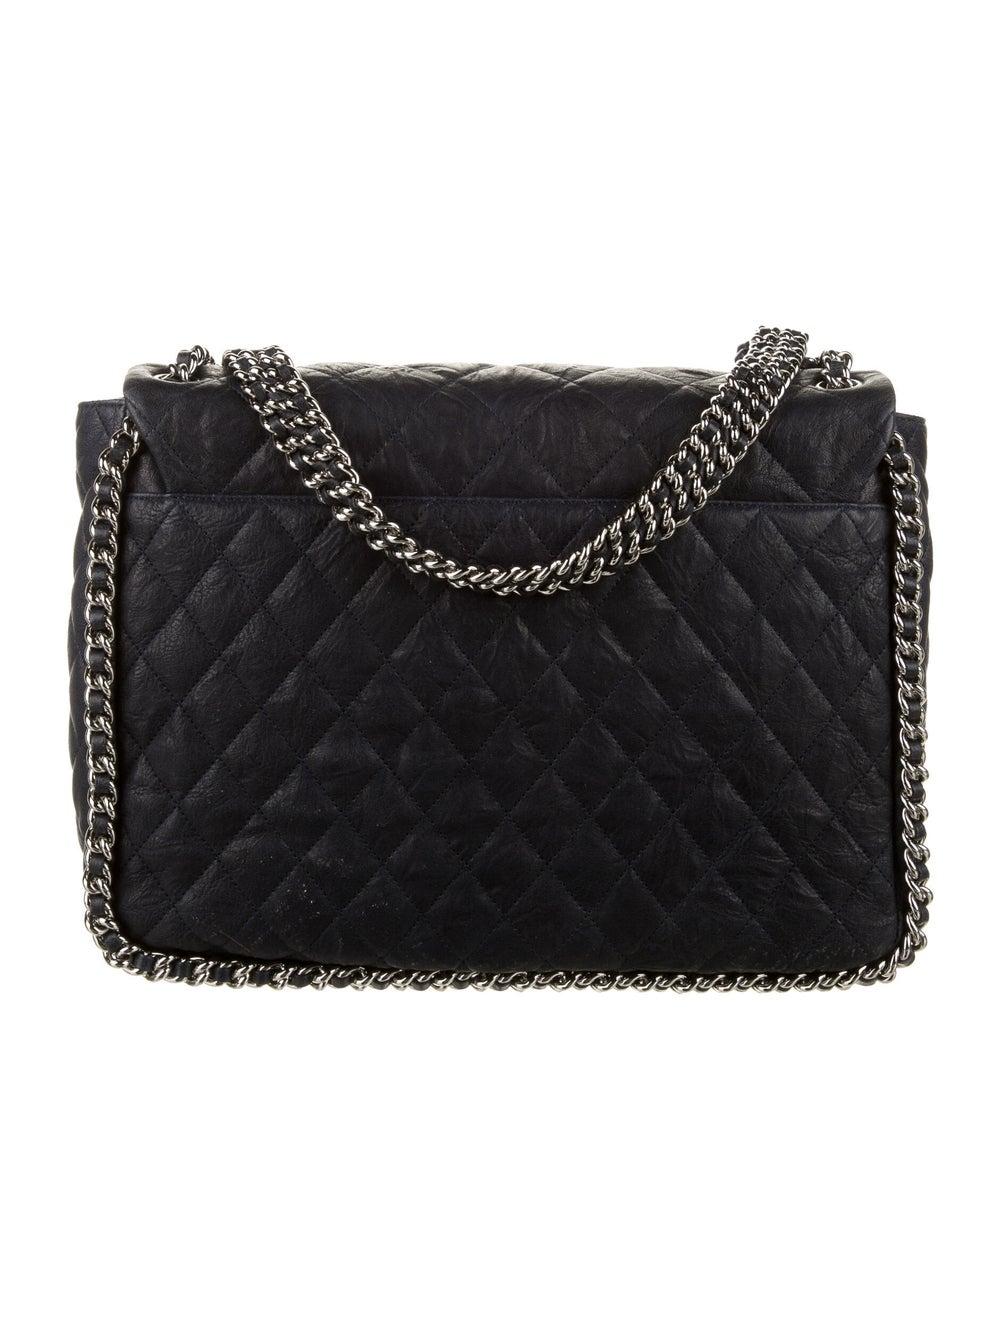 Chanel Chain Around Maxi Flap Bag Blue - image 4